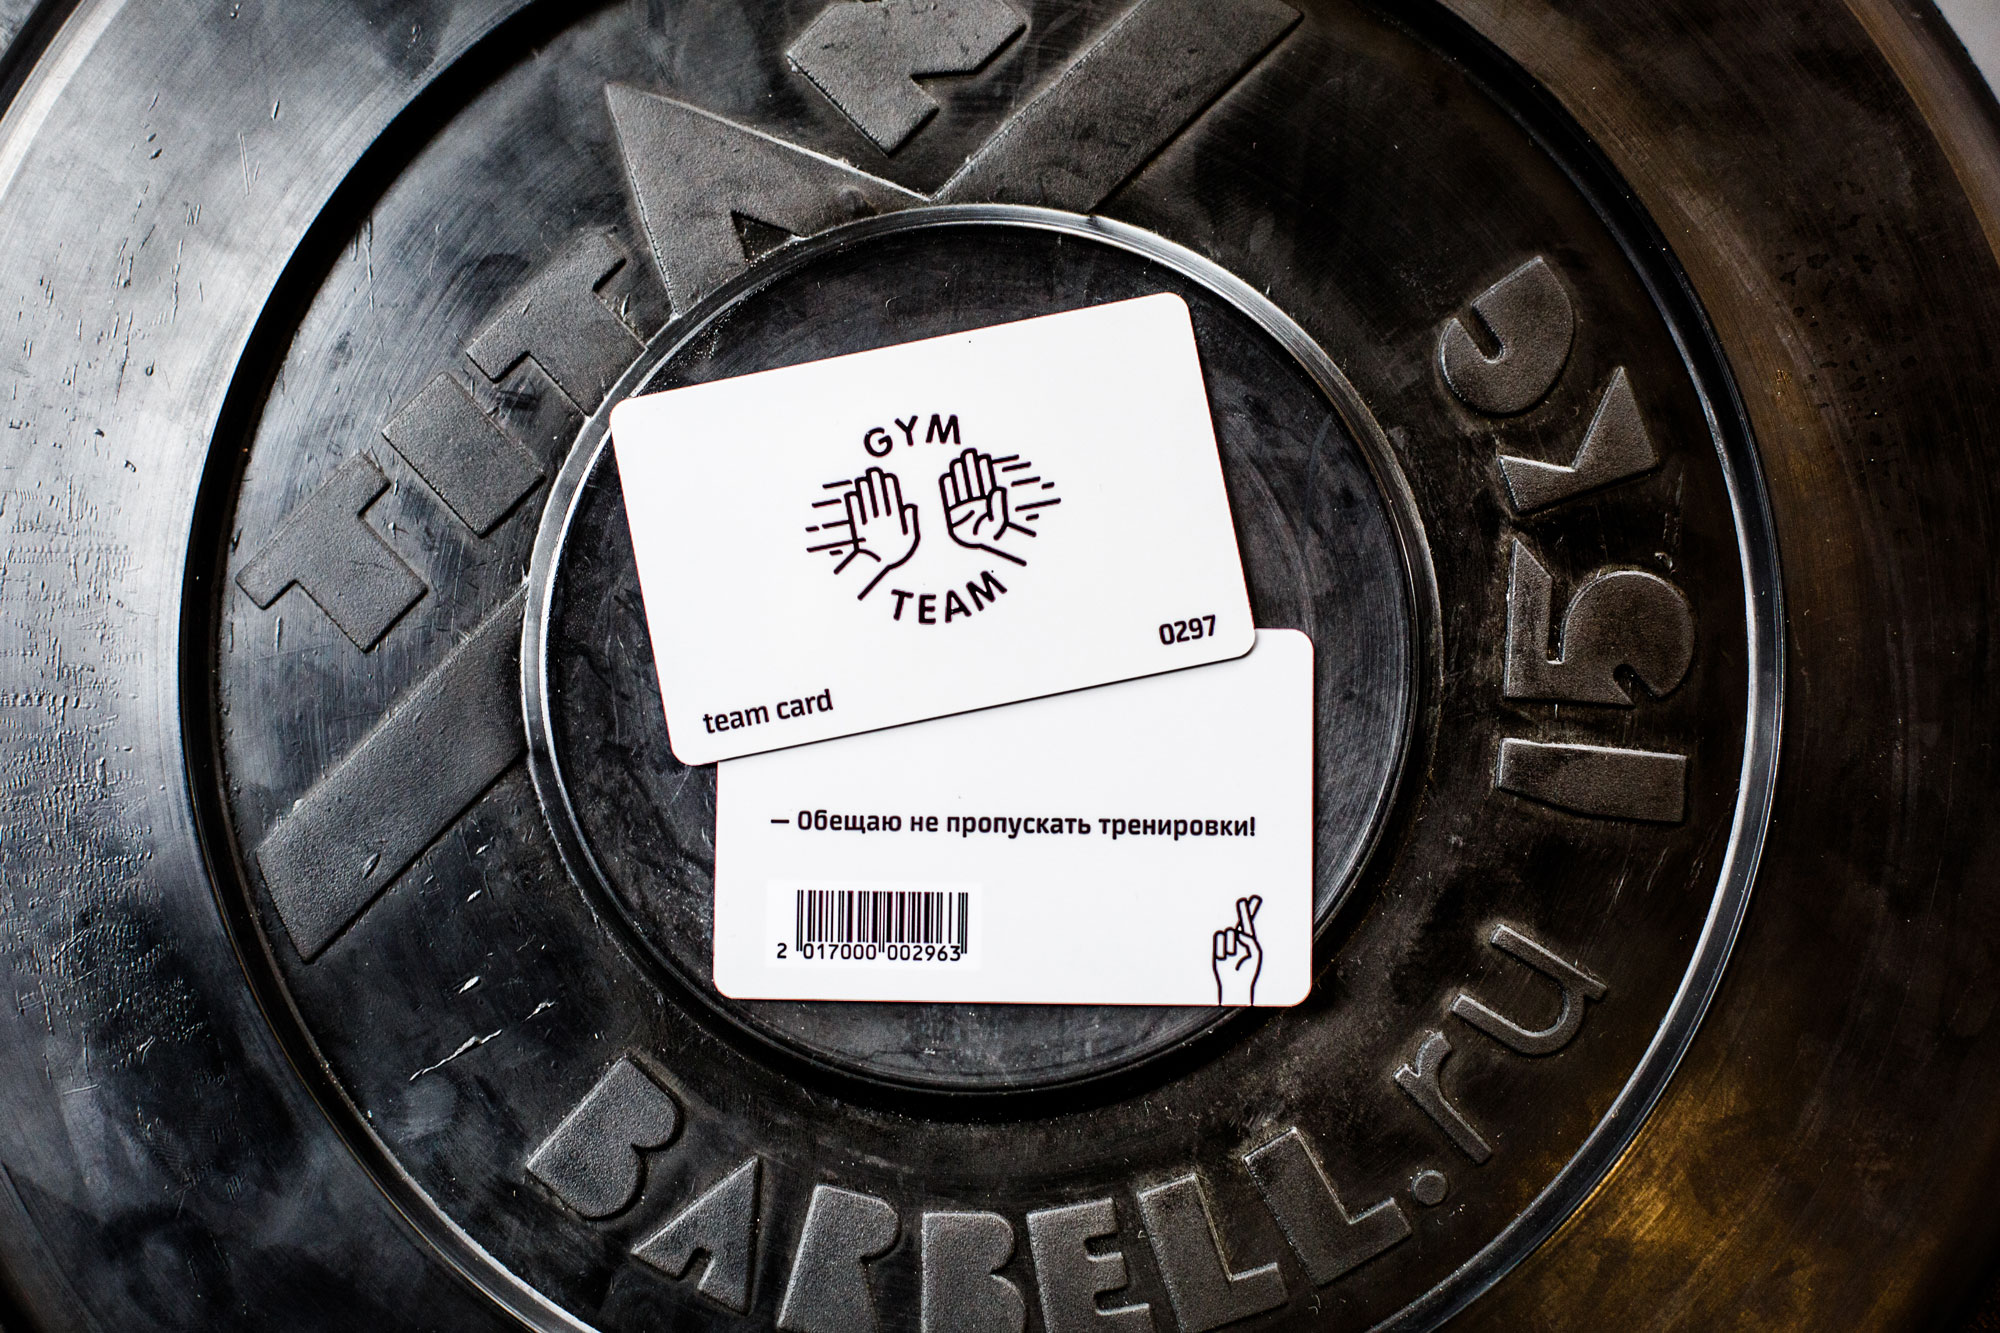 GYM TEAM健身俱乐部标识设计 © zernaev